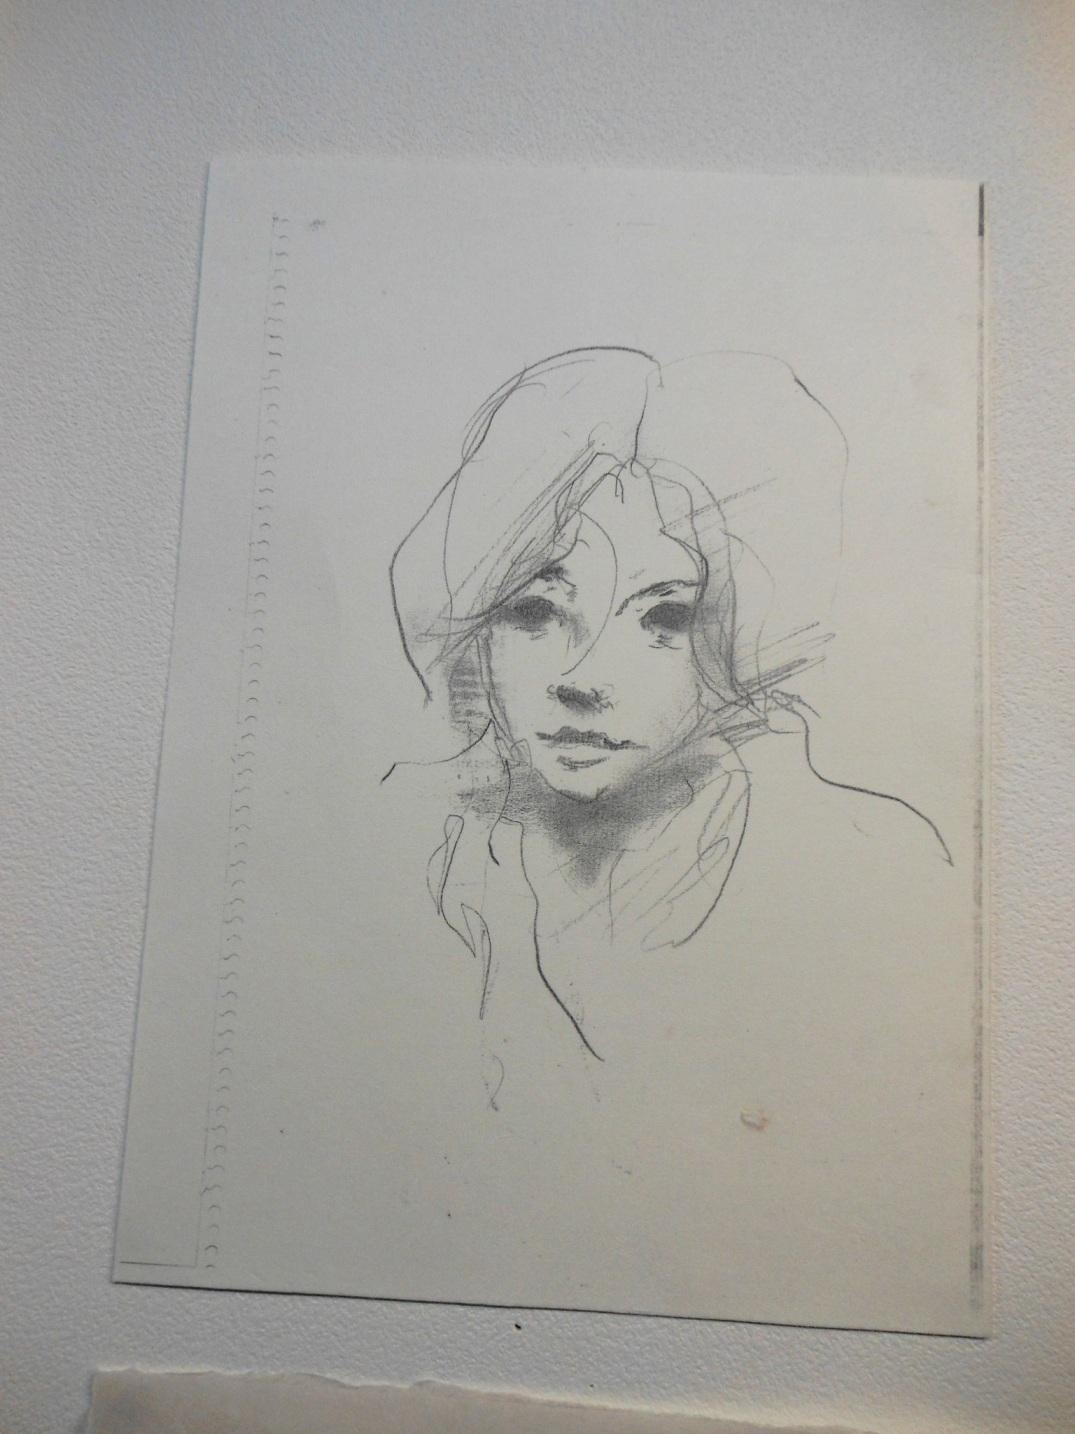 1650) 「栗田健・絵画展 『Portrait』」 af 終了・2月21日(火)~3月5日(月)_f0126829_20191876.jpg